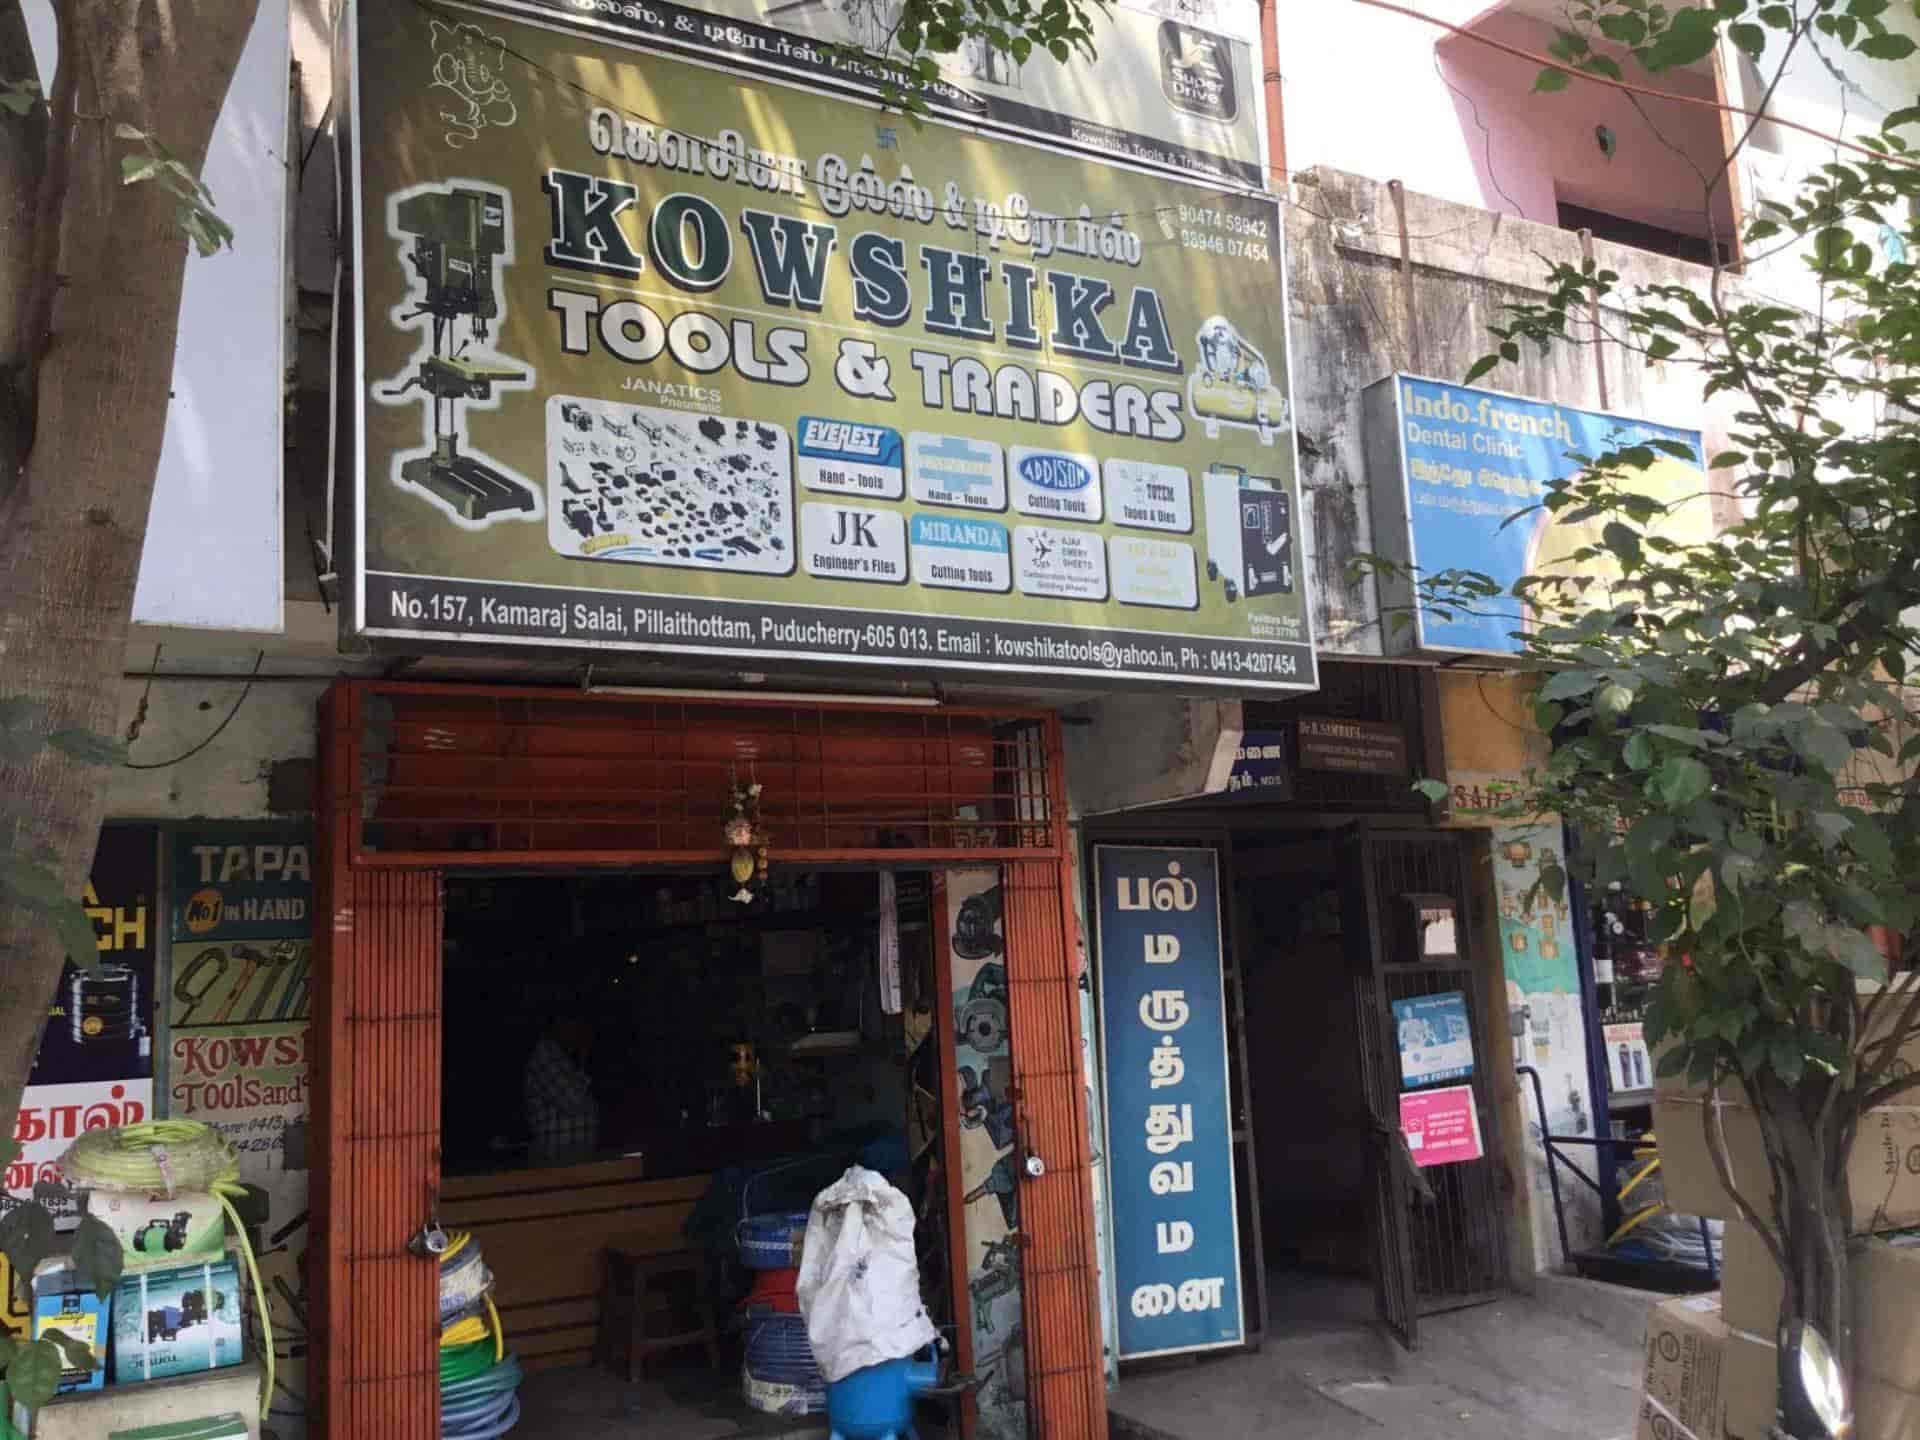 Kowshika Tools & Traders, Saram - Hand Tool Dealers in